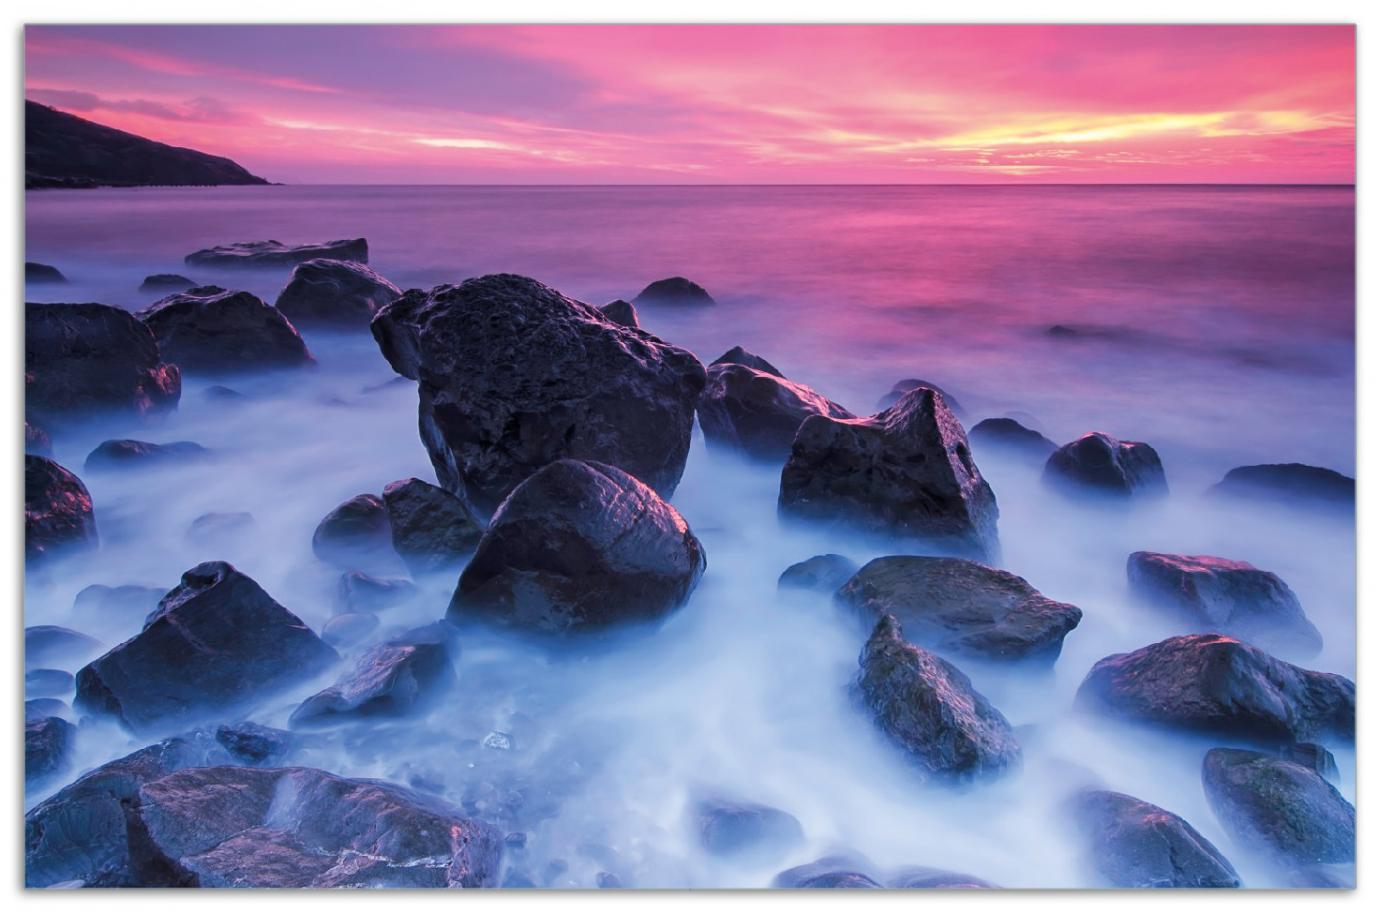 Herdabdeckplatte Felsen im Meer bei Sonnenuntergang – Bild 1